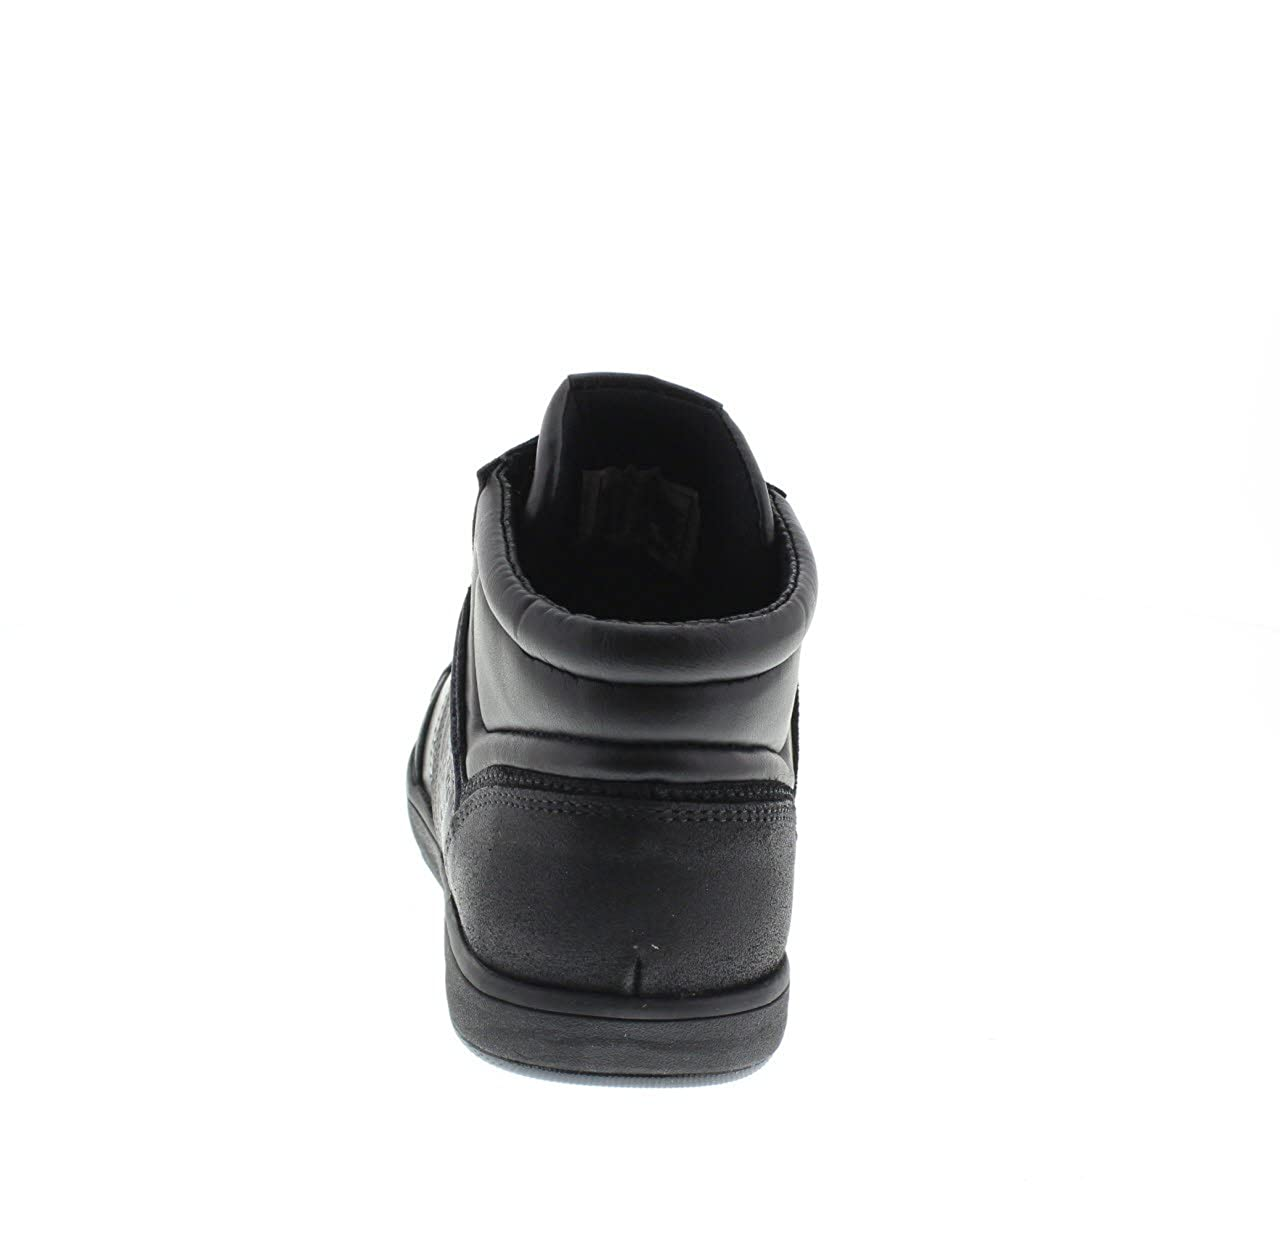 227538 beyers mid hommes Chaussures en Marron